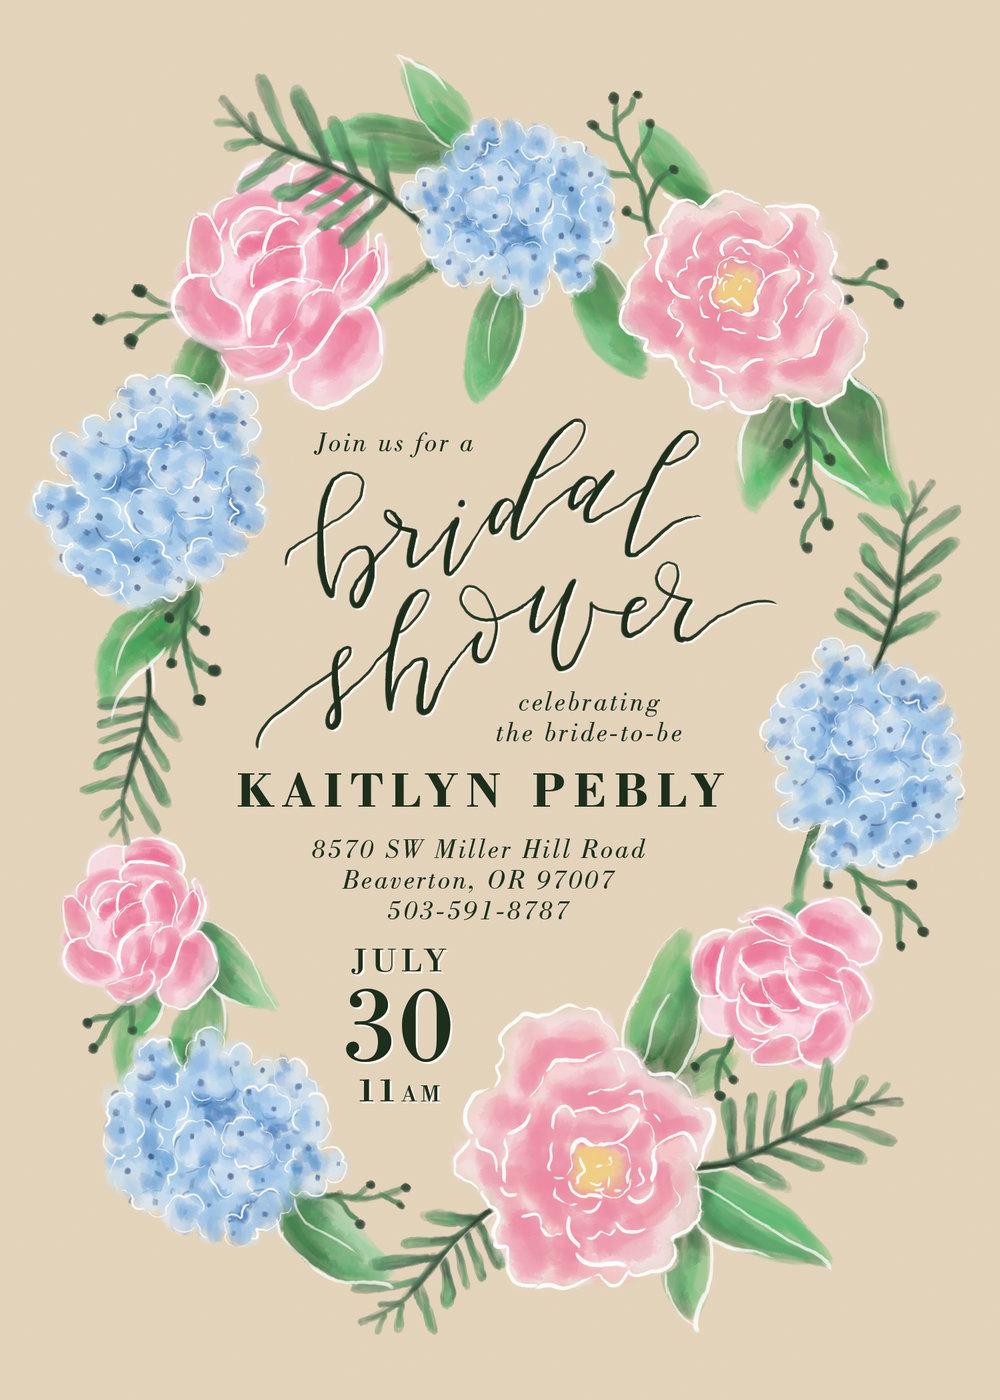 Bridal Shower Invitation_Preview.jpg